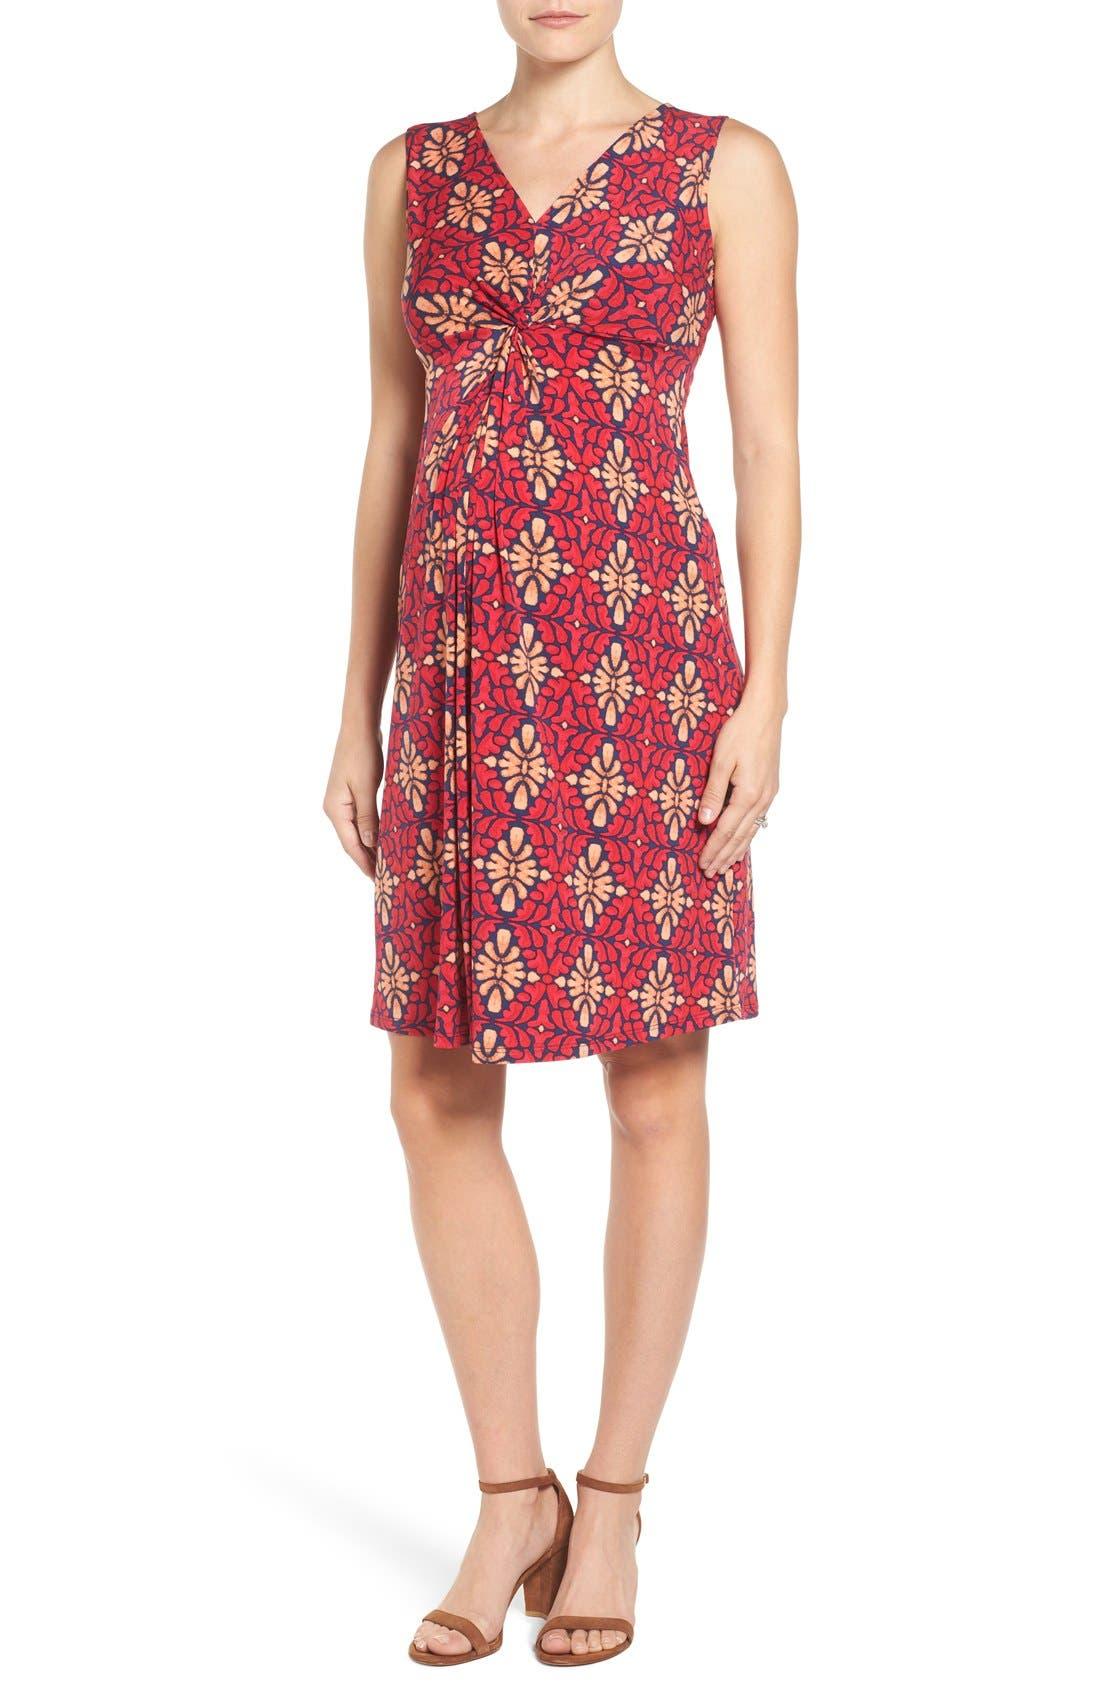 Leota Sleeveless Maternity Dress, Ivory